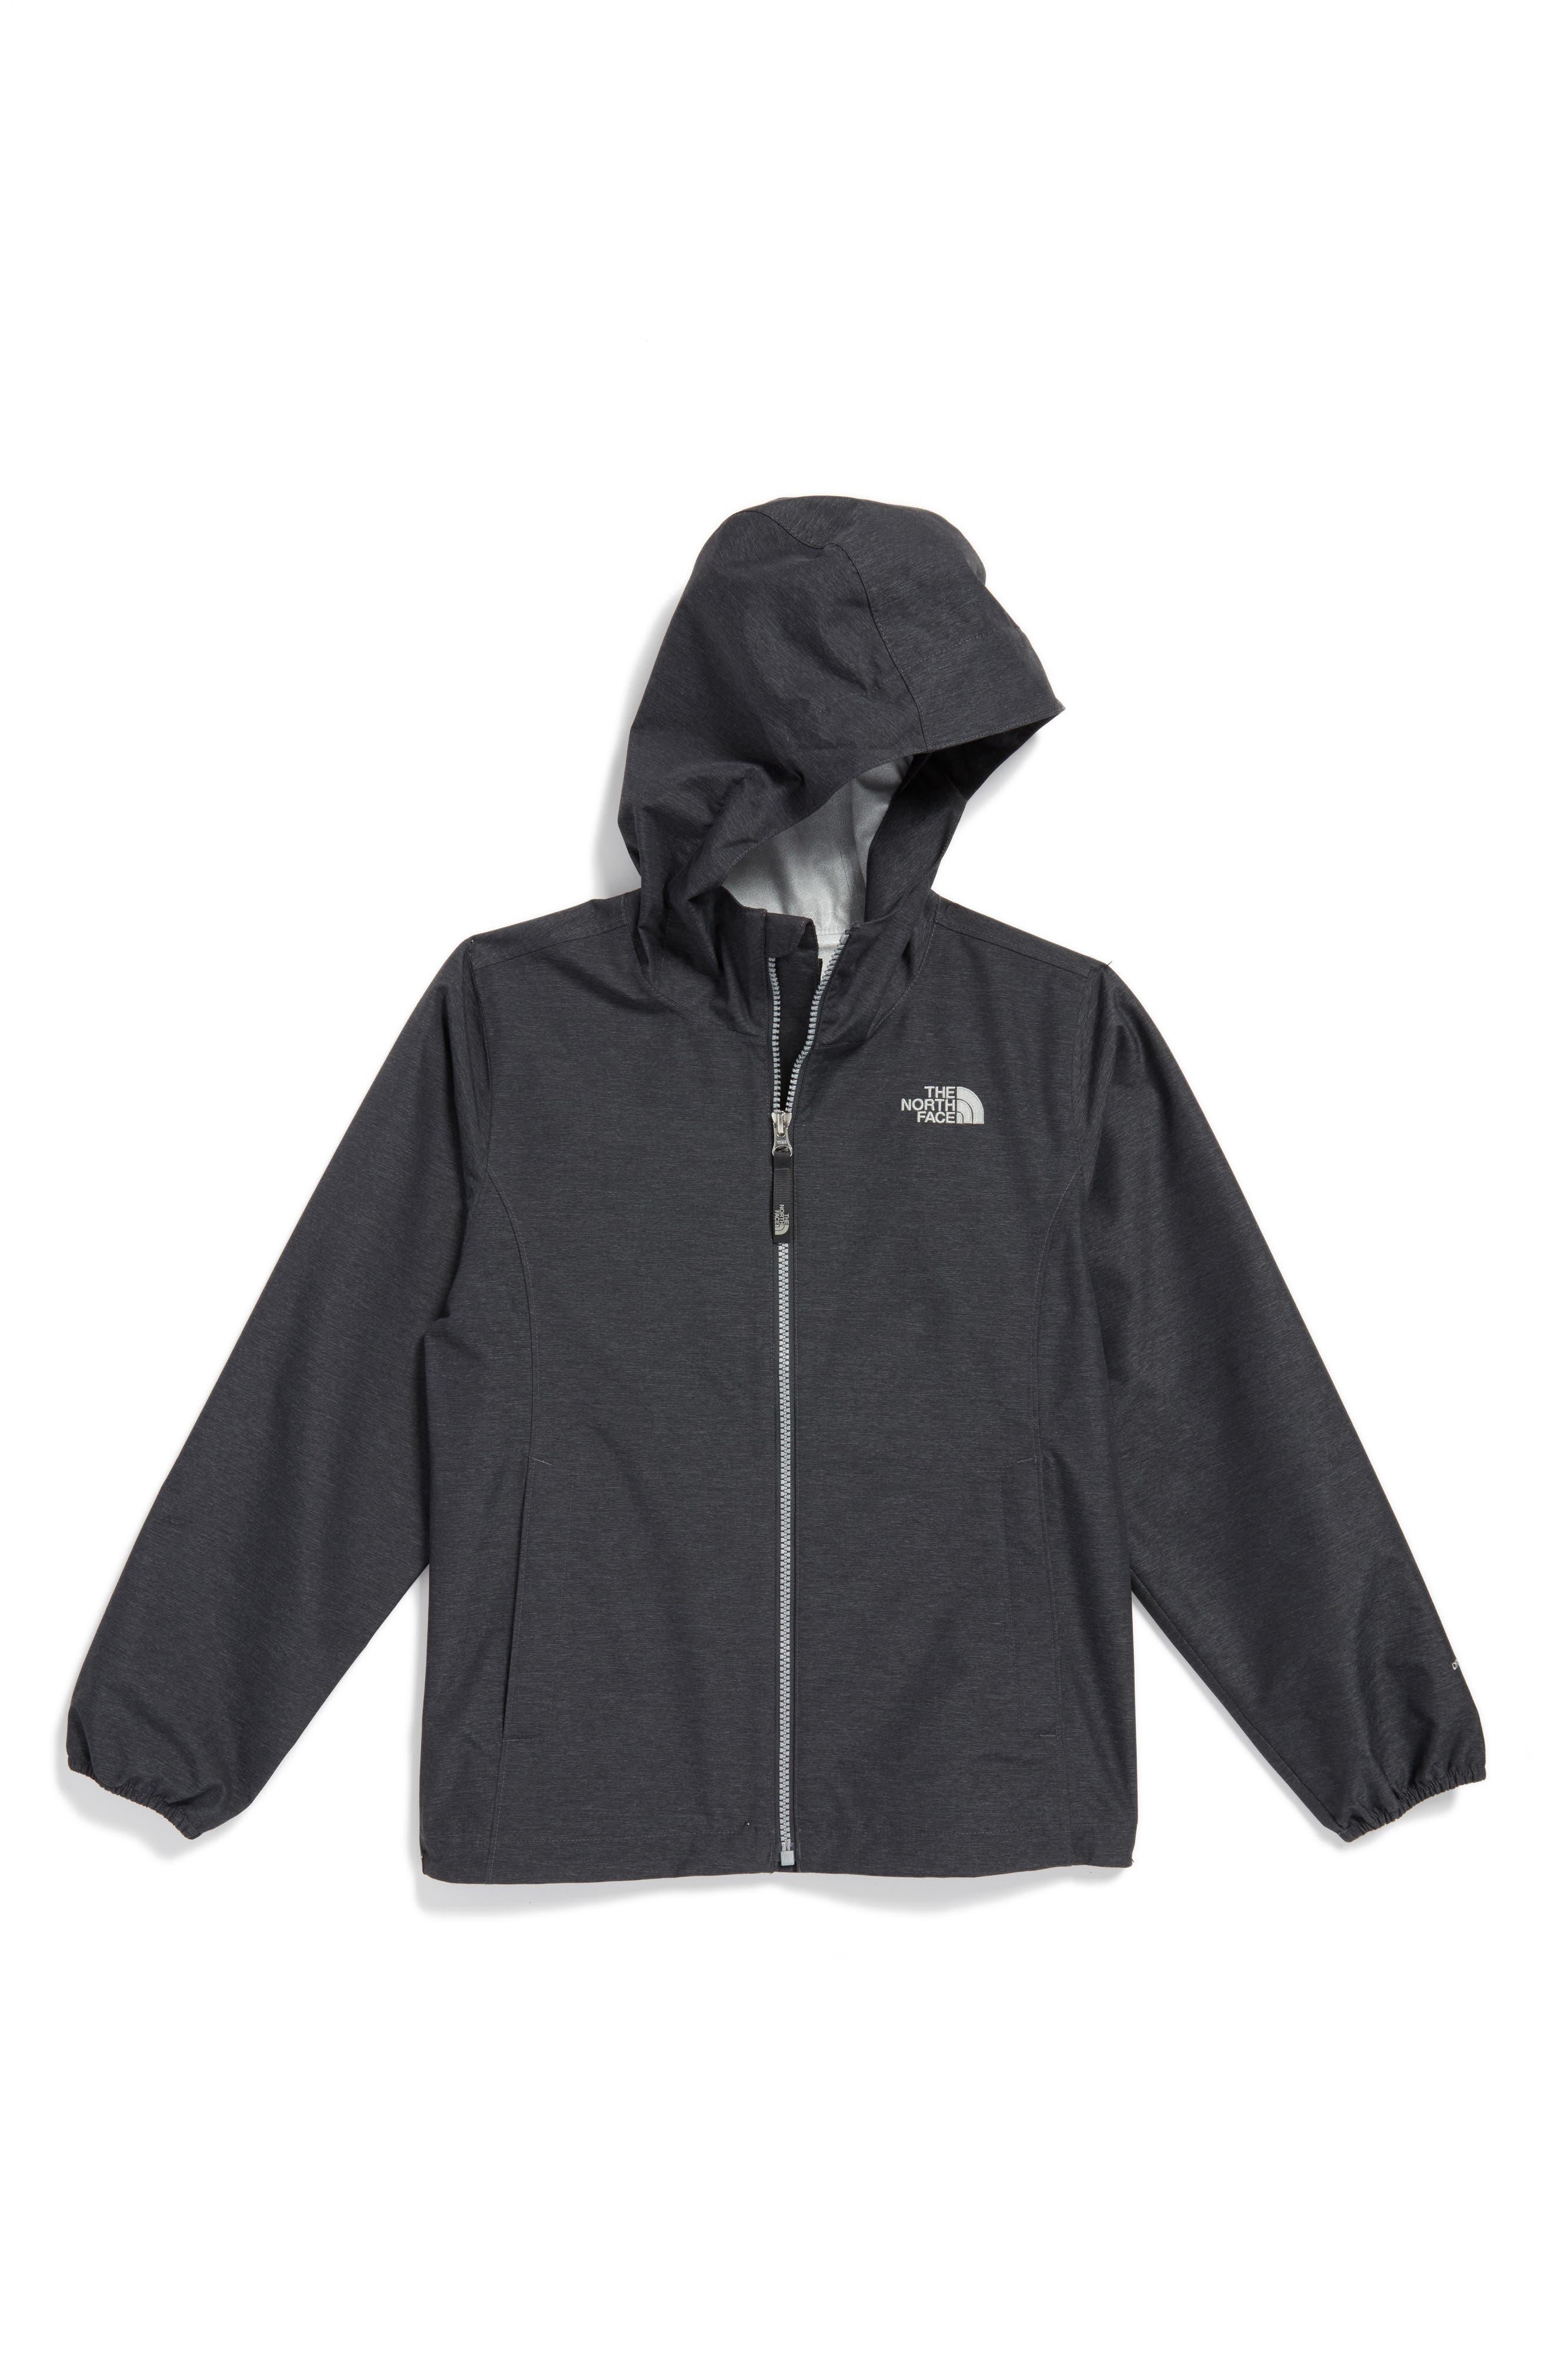 Magnolia Waterproof HyVent<sup>®</sup> Rain Jacket,                         Main,                         color, 021